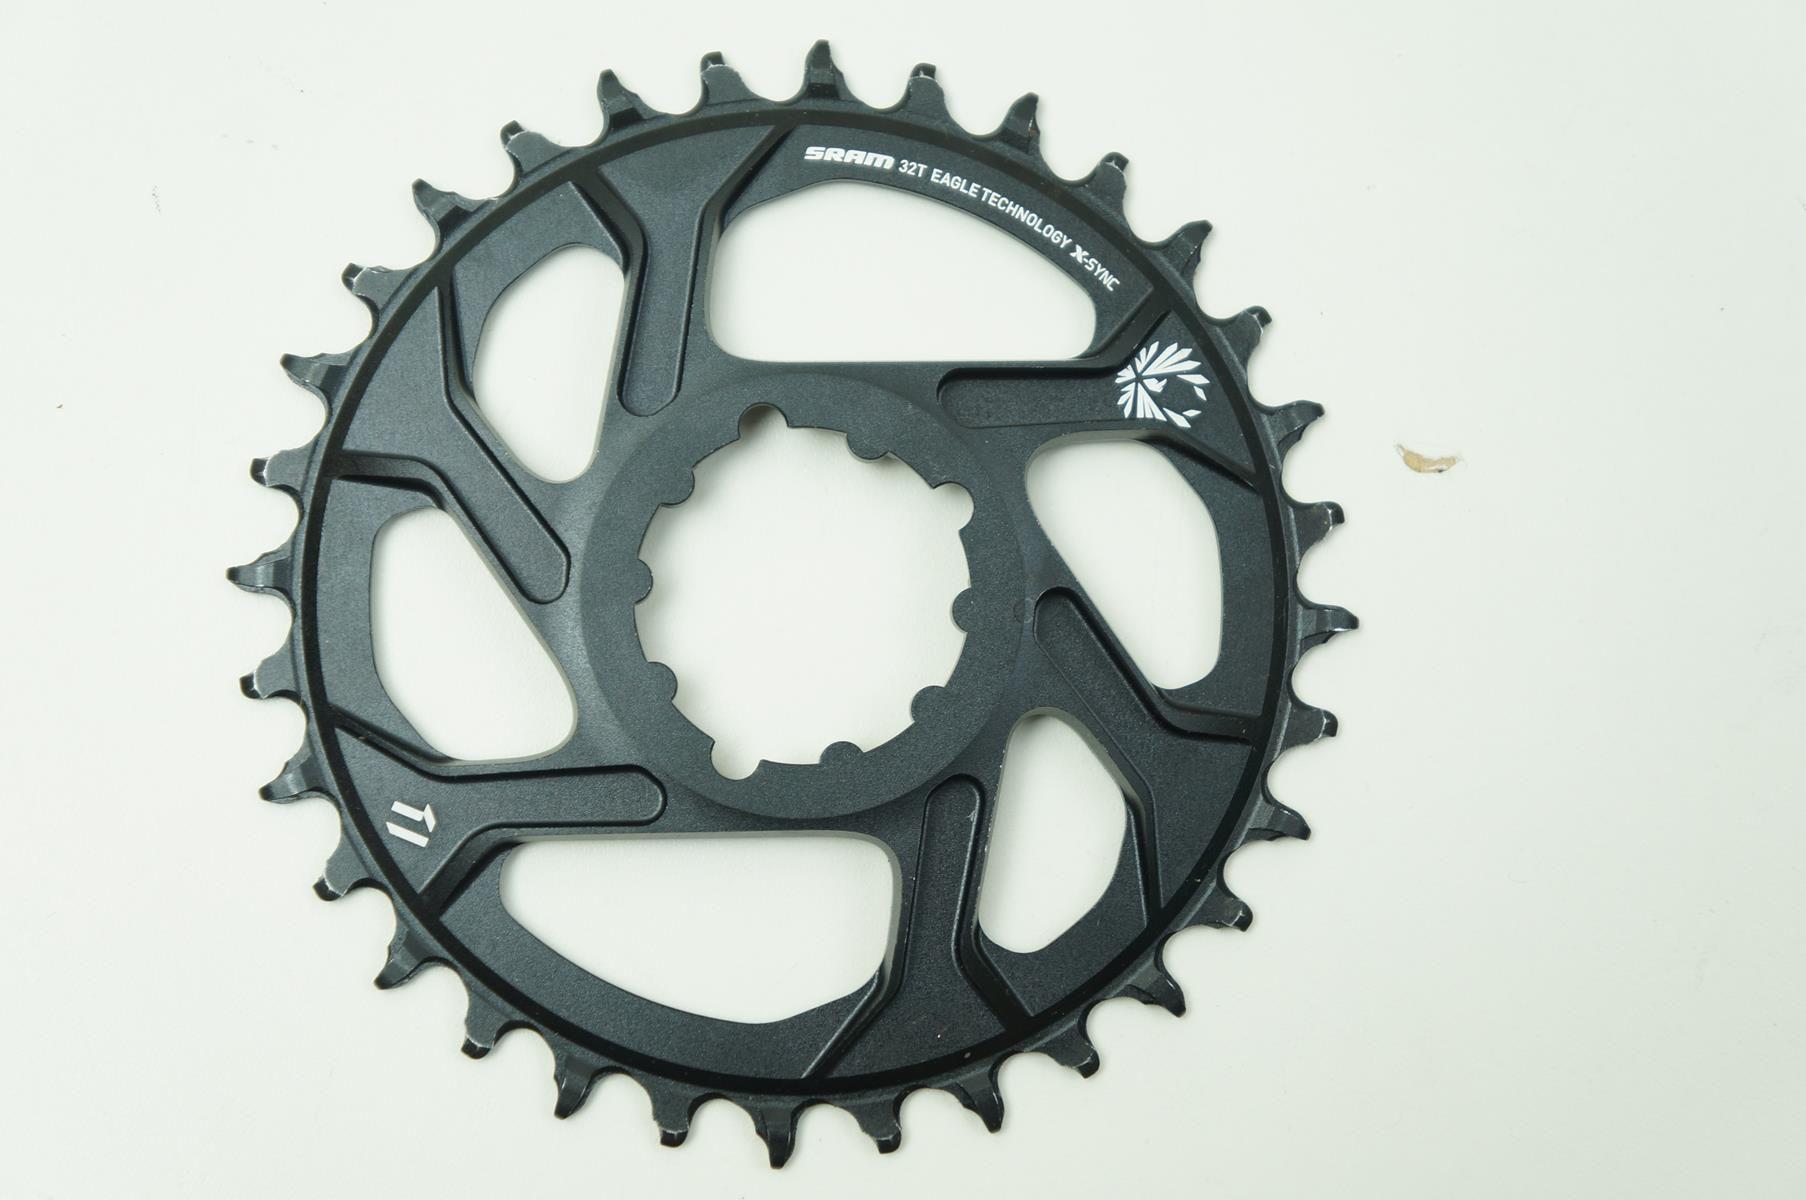 Coroa Bicicleta Sram Xx1 Eagle 32t Preta Para Uso 1x12 GX X01 Eagle